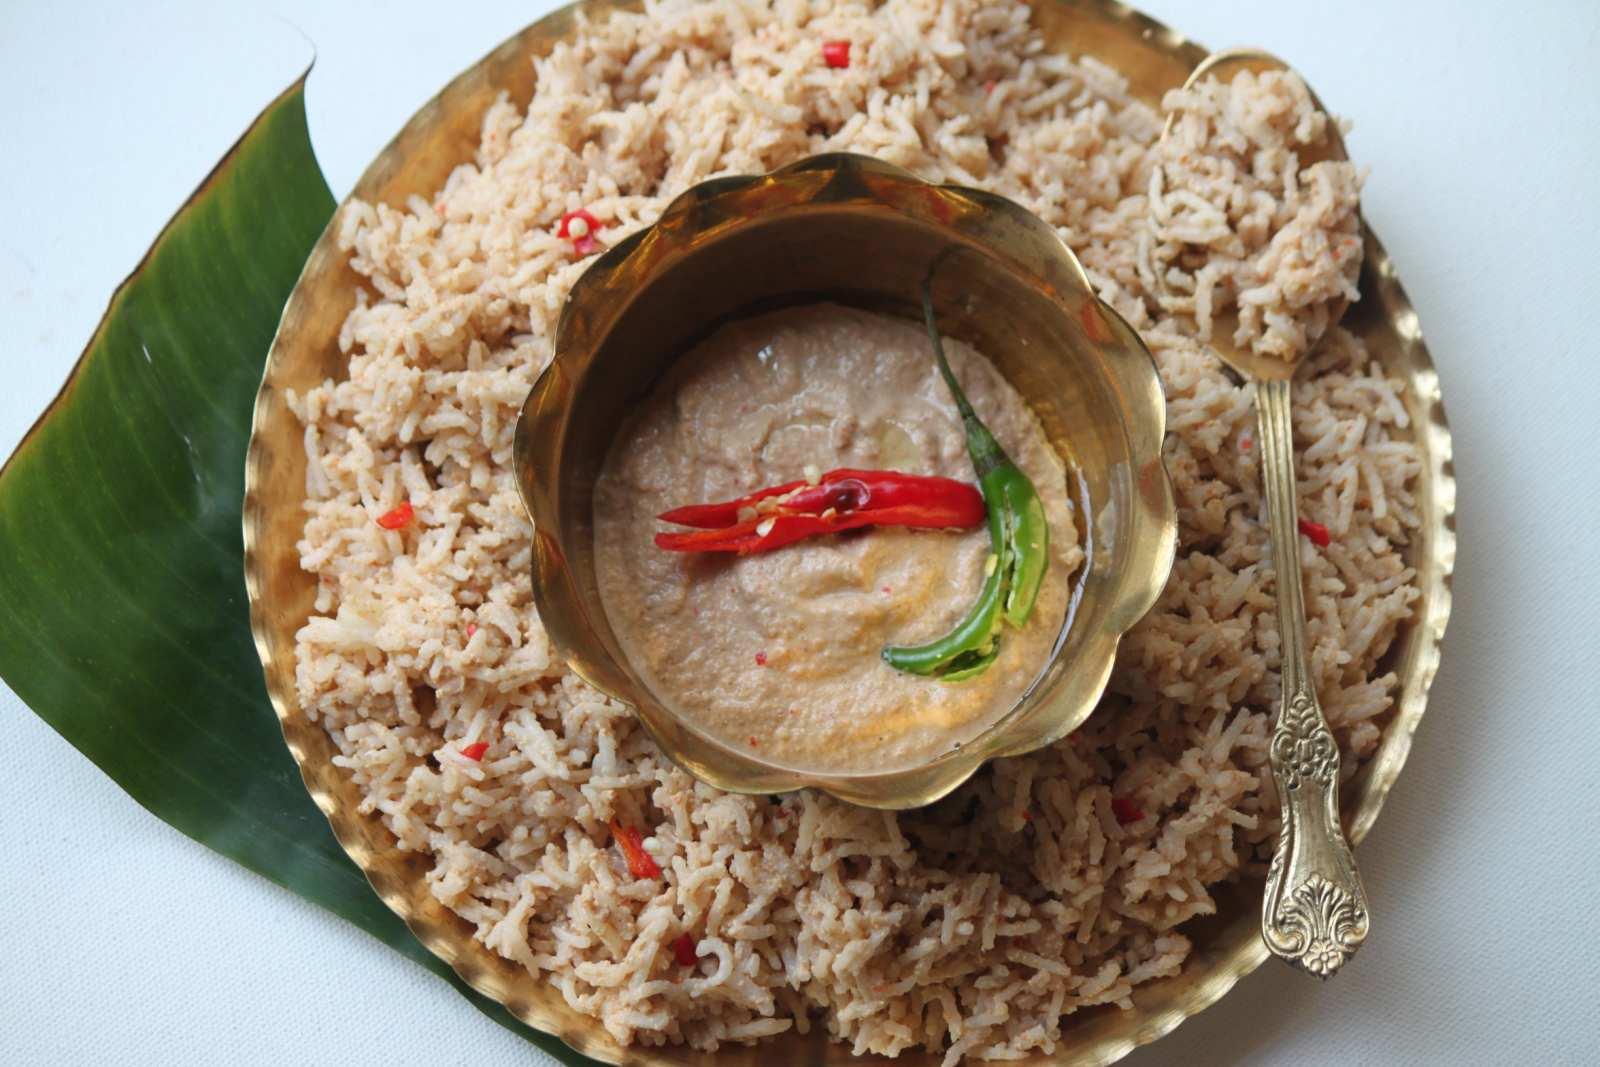 Bengali posto bhat recipe poppy seed rice by archanas kitchen bengali posto bhat recipe poppy seed rice forumfinder Choice Image